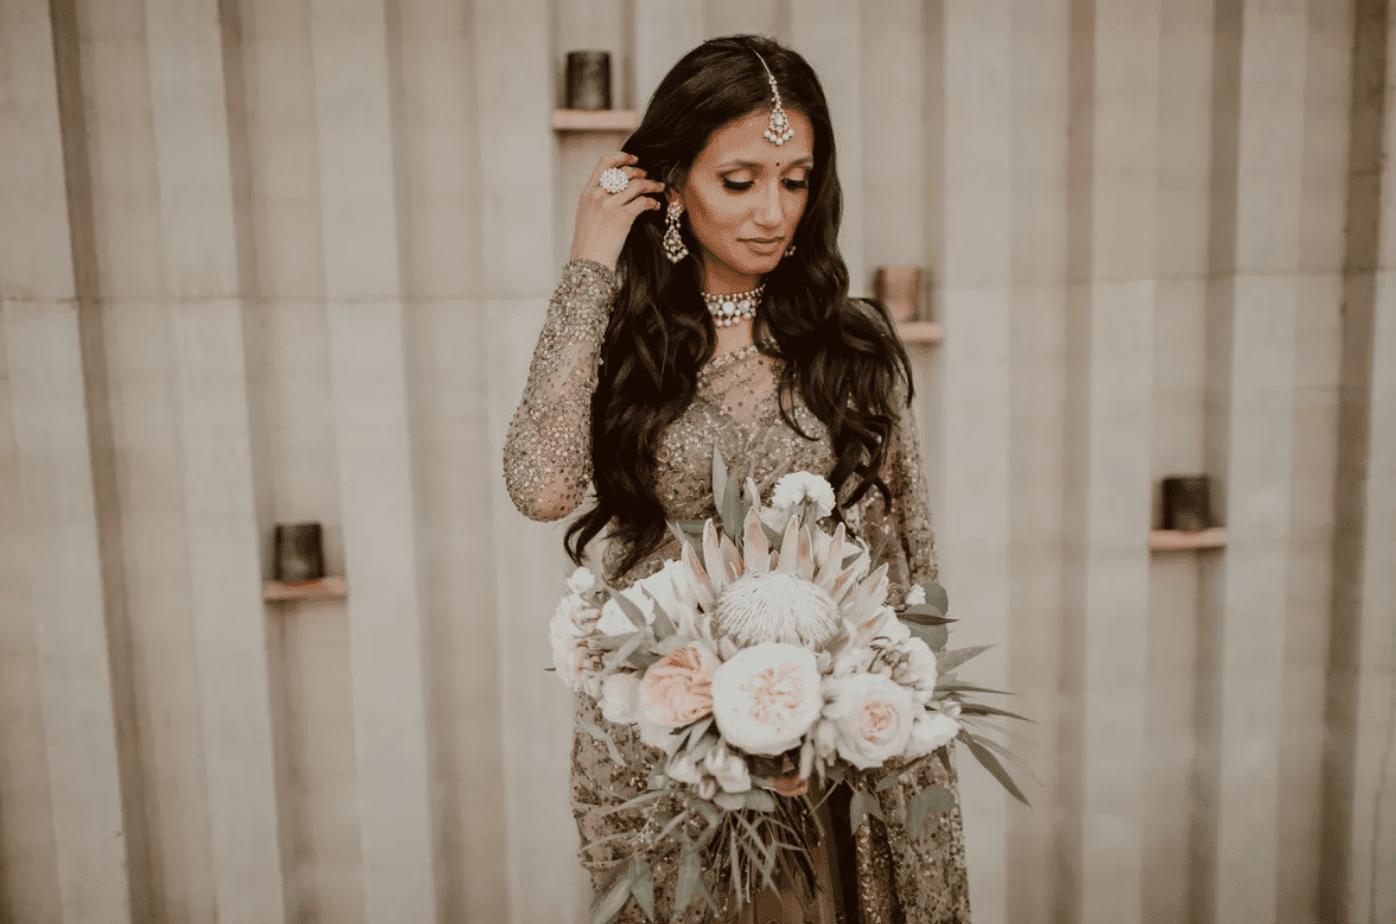 bride wearing traditional indian wedding attire